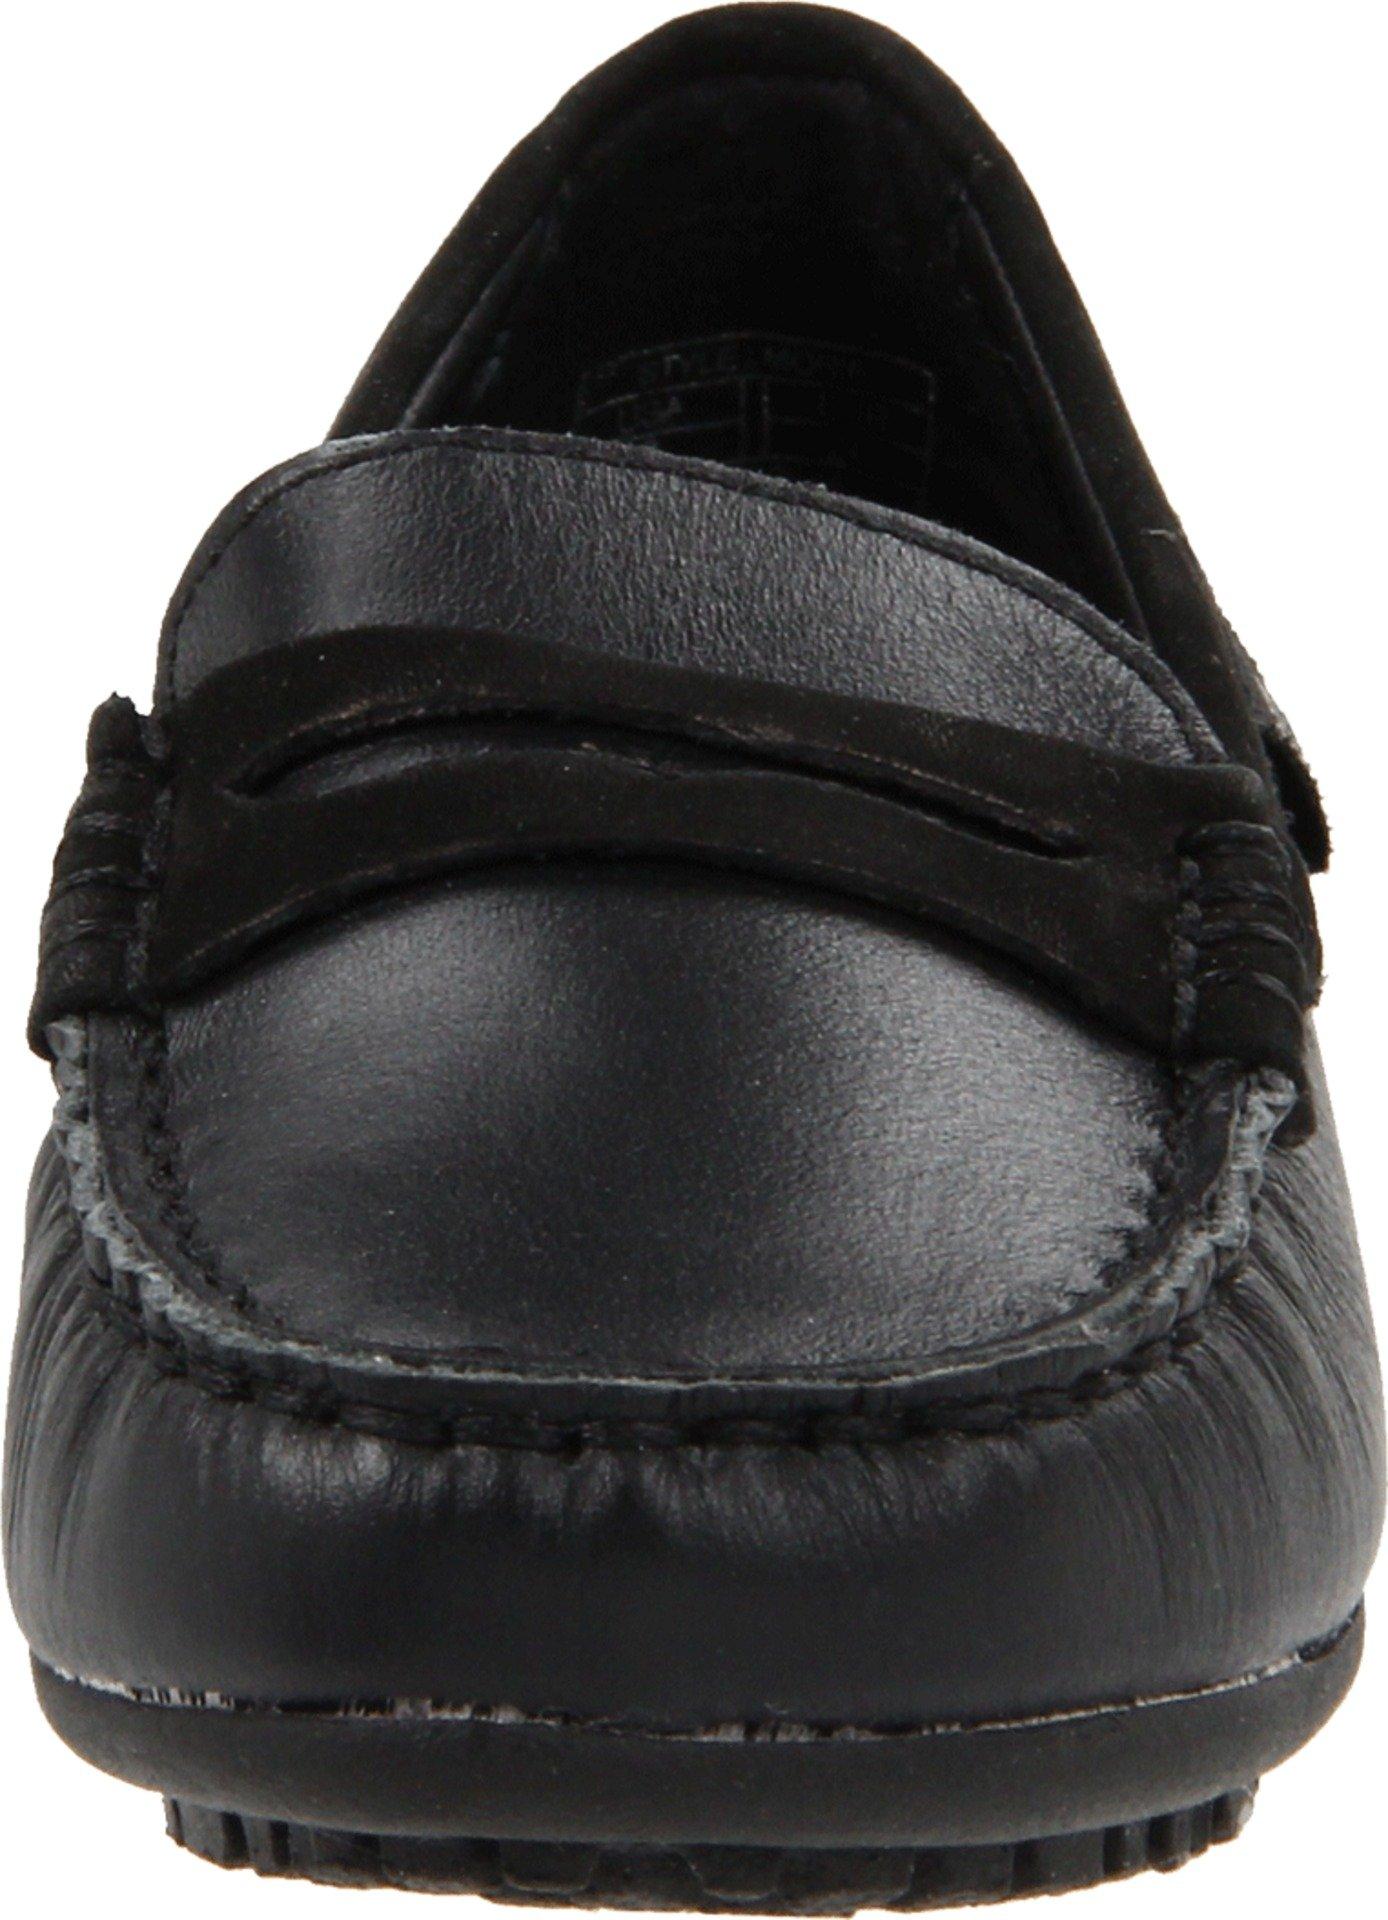 umi  Morie Penny Uniform Slip-On (Toddler/Little Kid/Big Kid),Black Smooth,28 EU (10.5 M US Little Kid) by umi (Image #4)